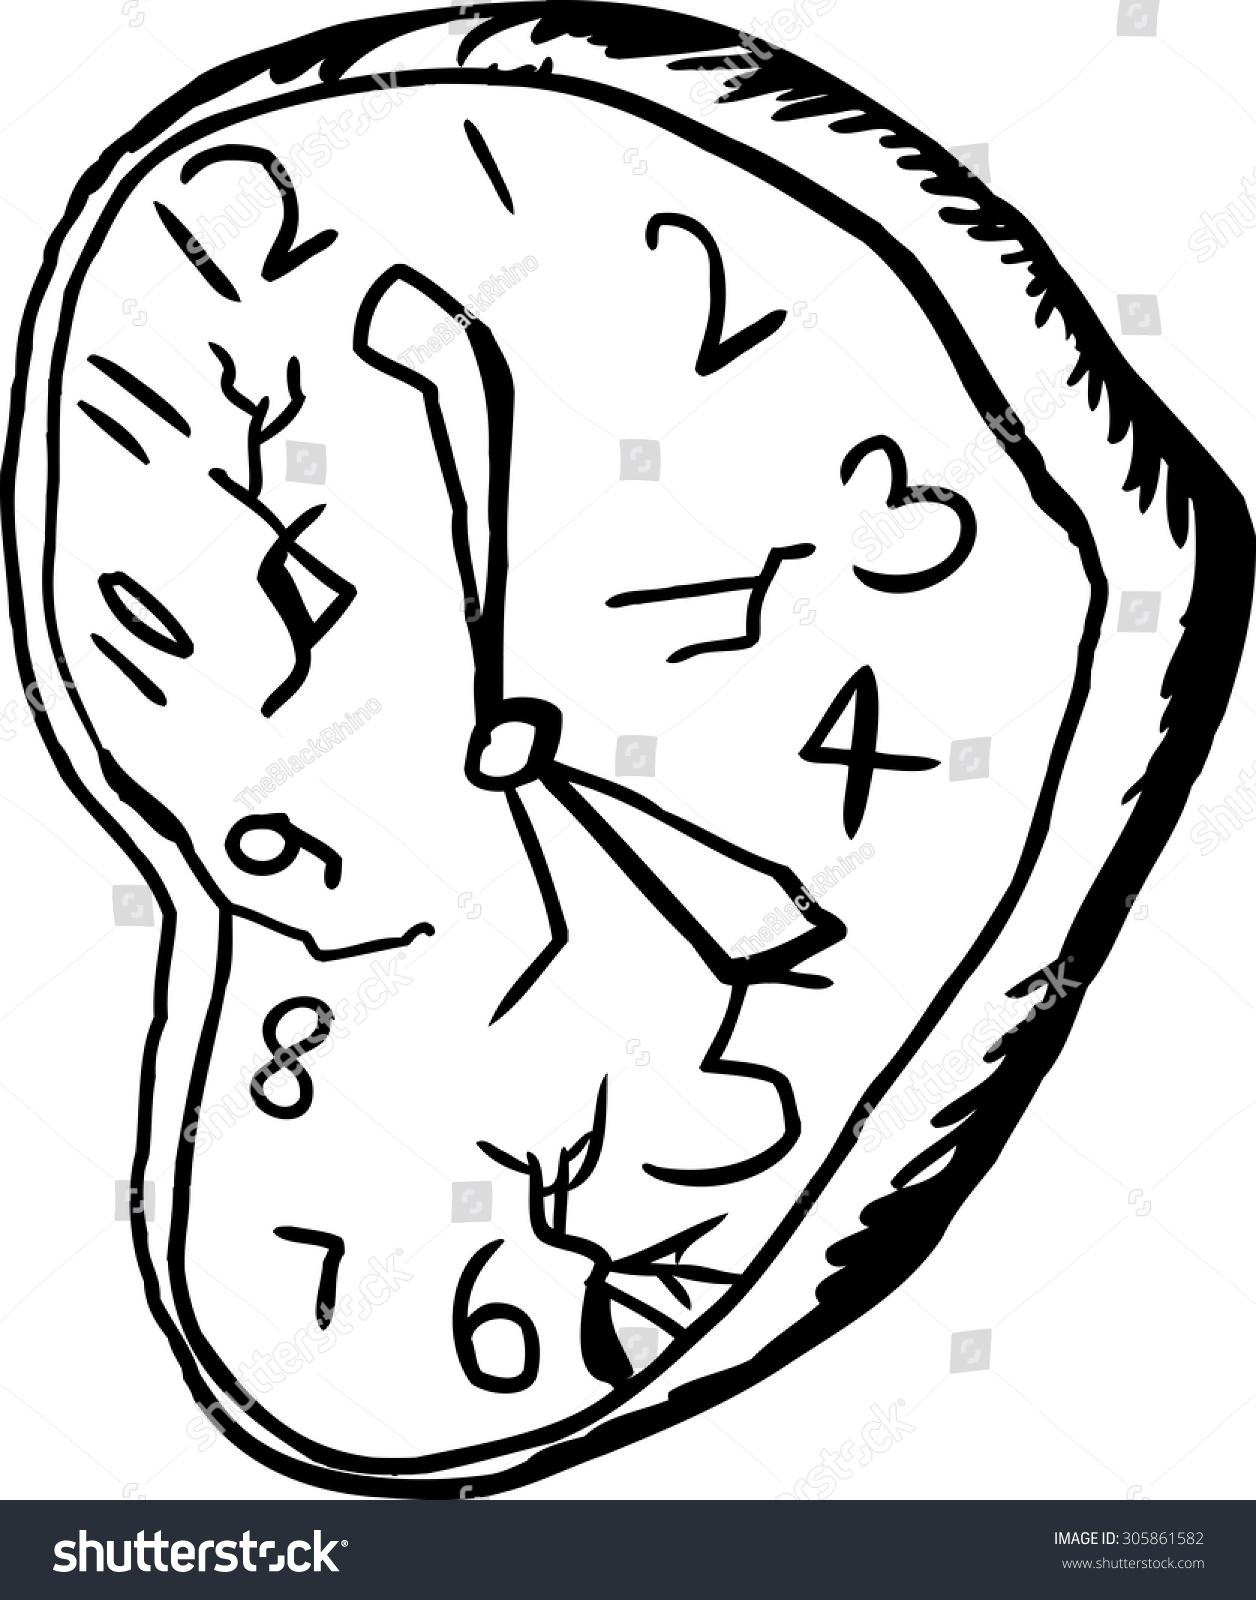 Watch more like Broken Clock Cartoon